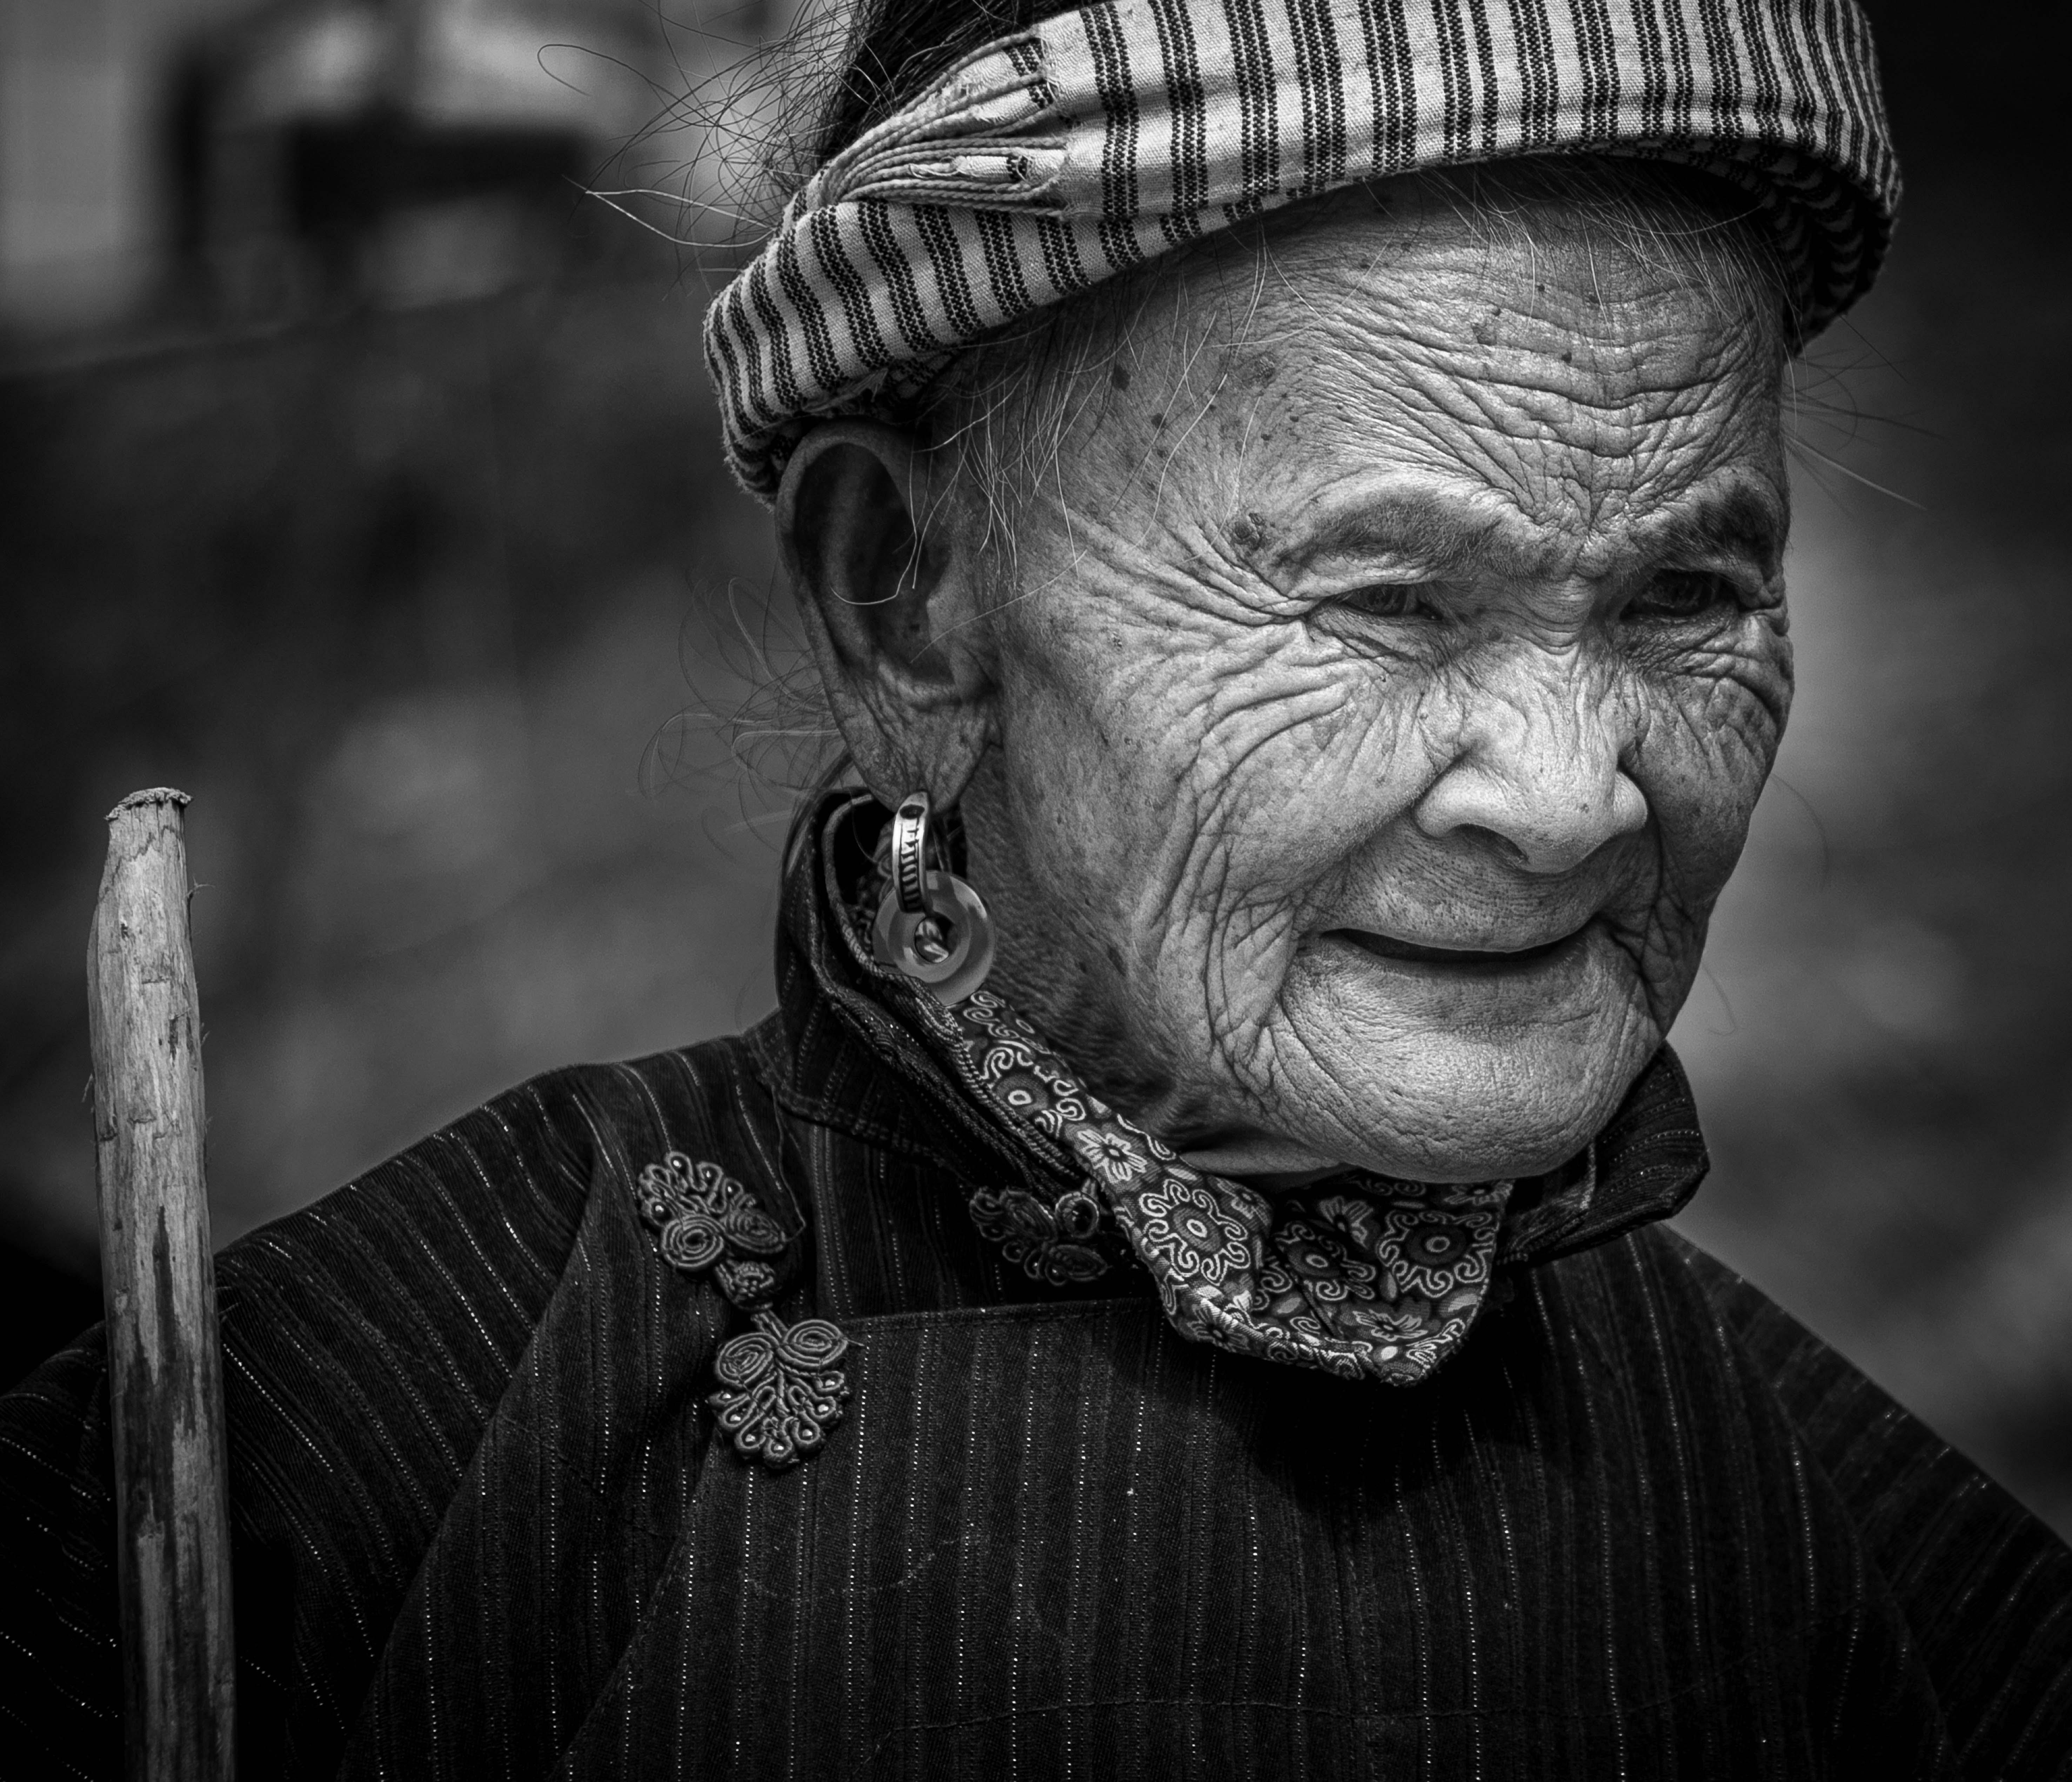 Wrinkles of Life Ed. 1/5